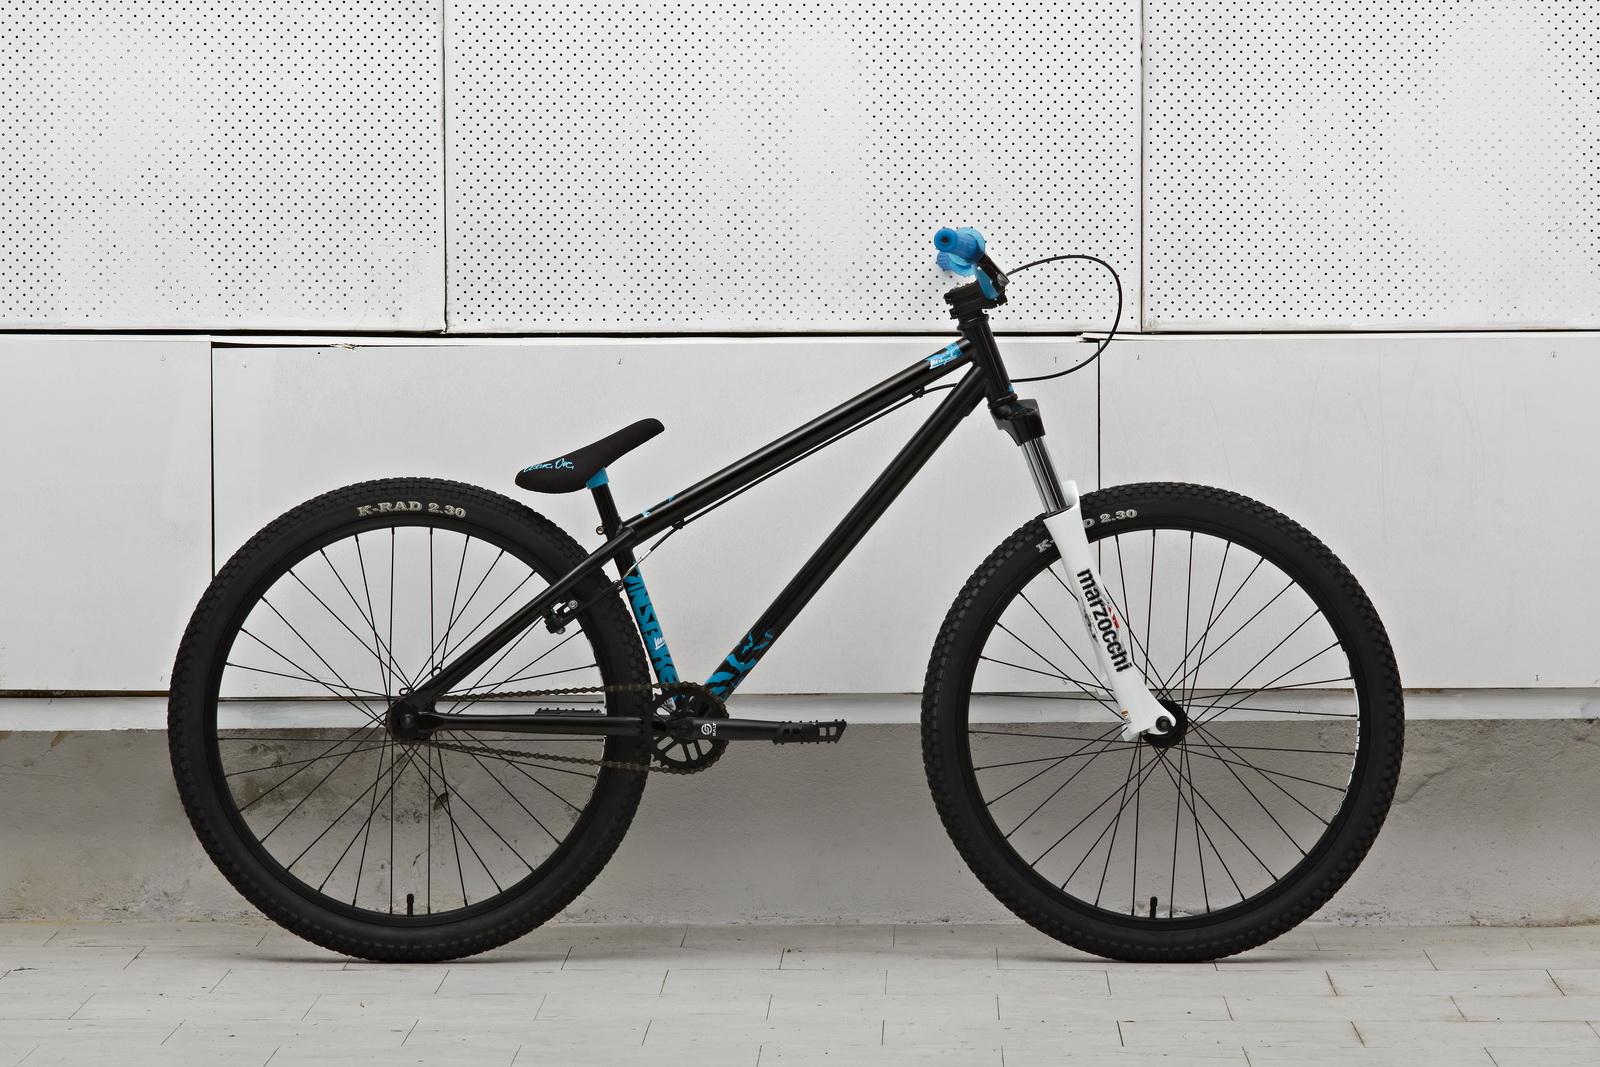 Drag Racing Helmets >> NS Bikes Metropolis 3 2012 - ns-bikes - Mountain Biking Pictures - Vital MTB